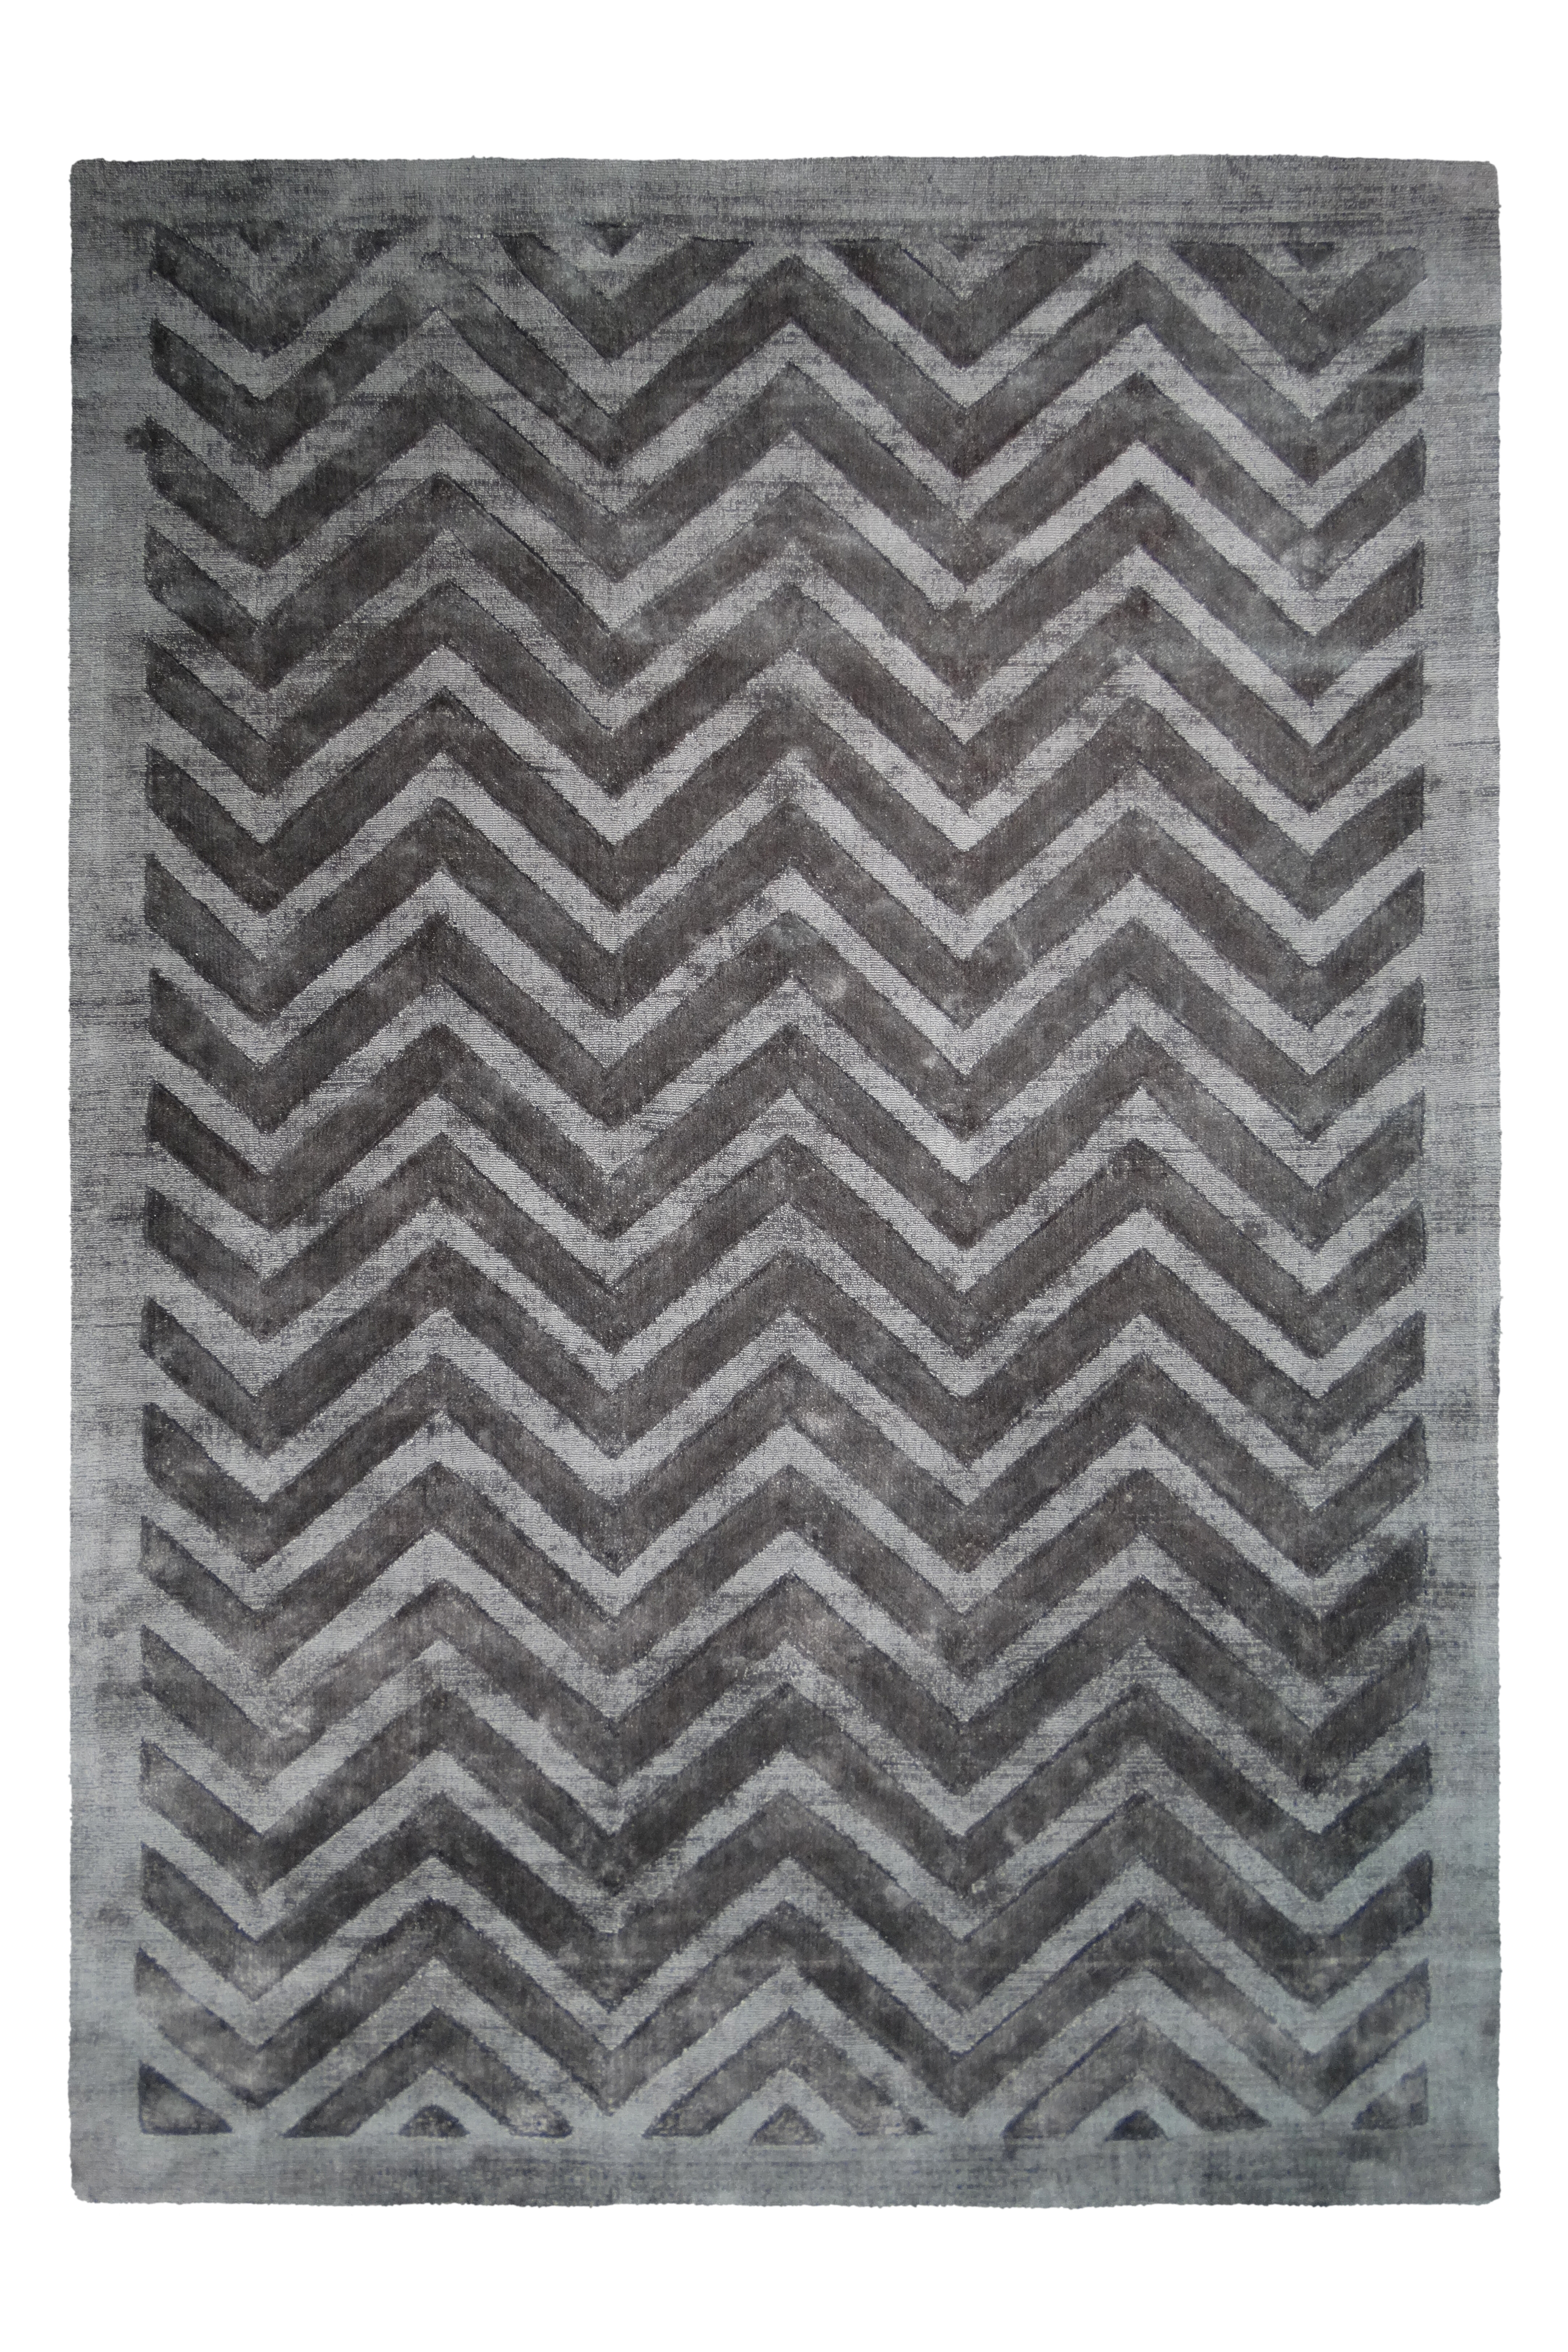 Kayoom Vloerkleed 'Luxury 410' kleur Grijs / Antraciet, 80 x 150cm